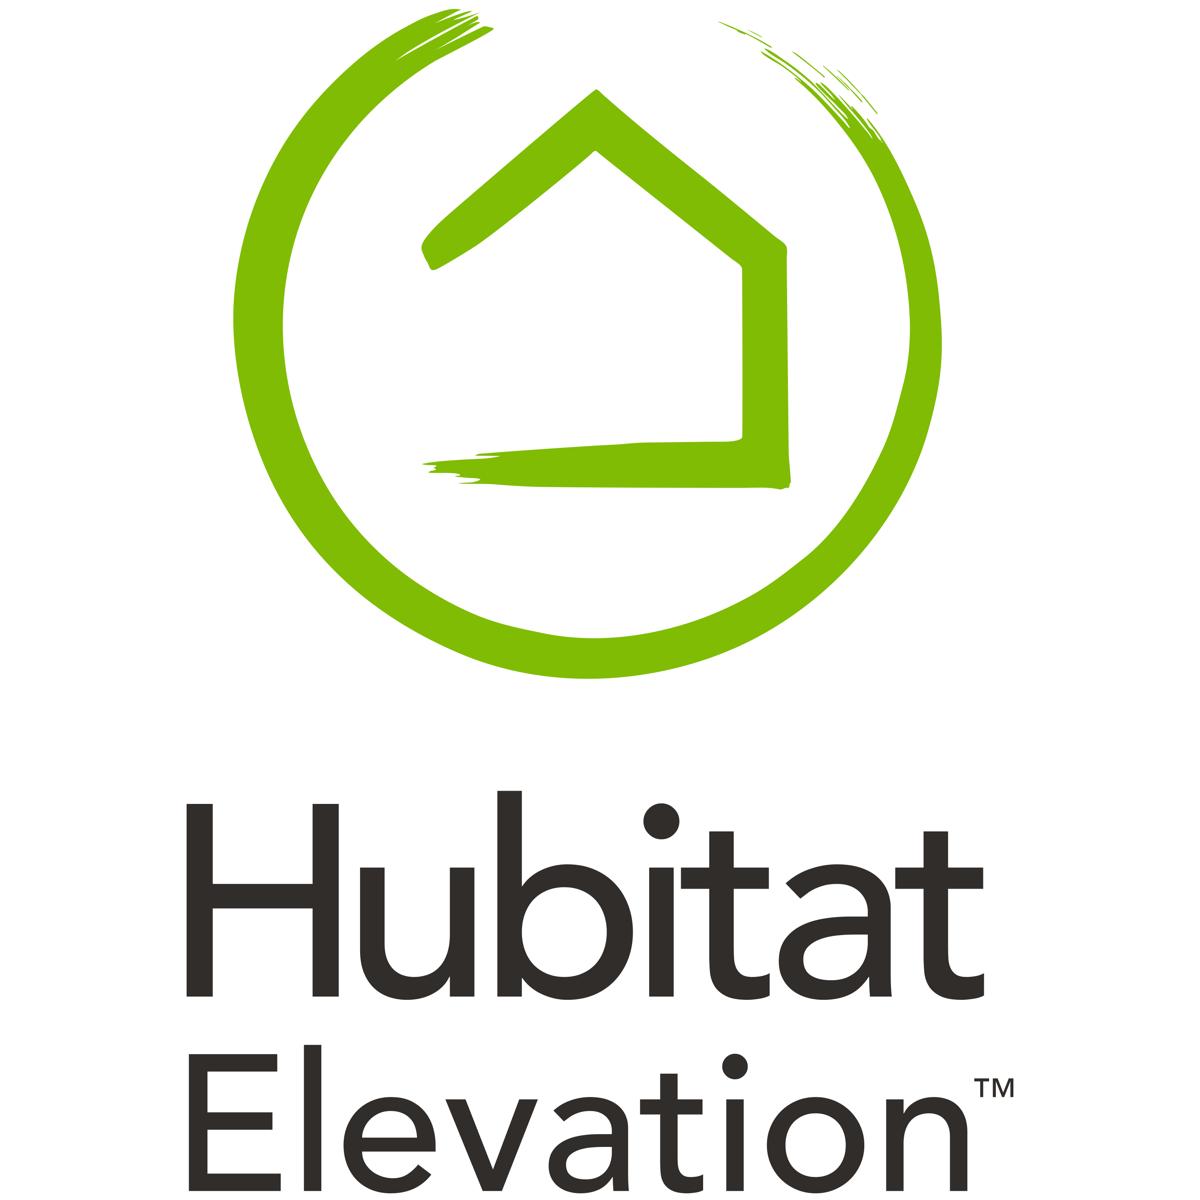 Hubitat Elevation